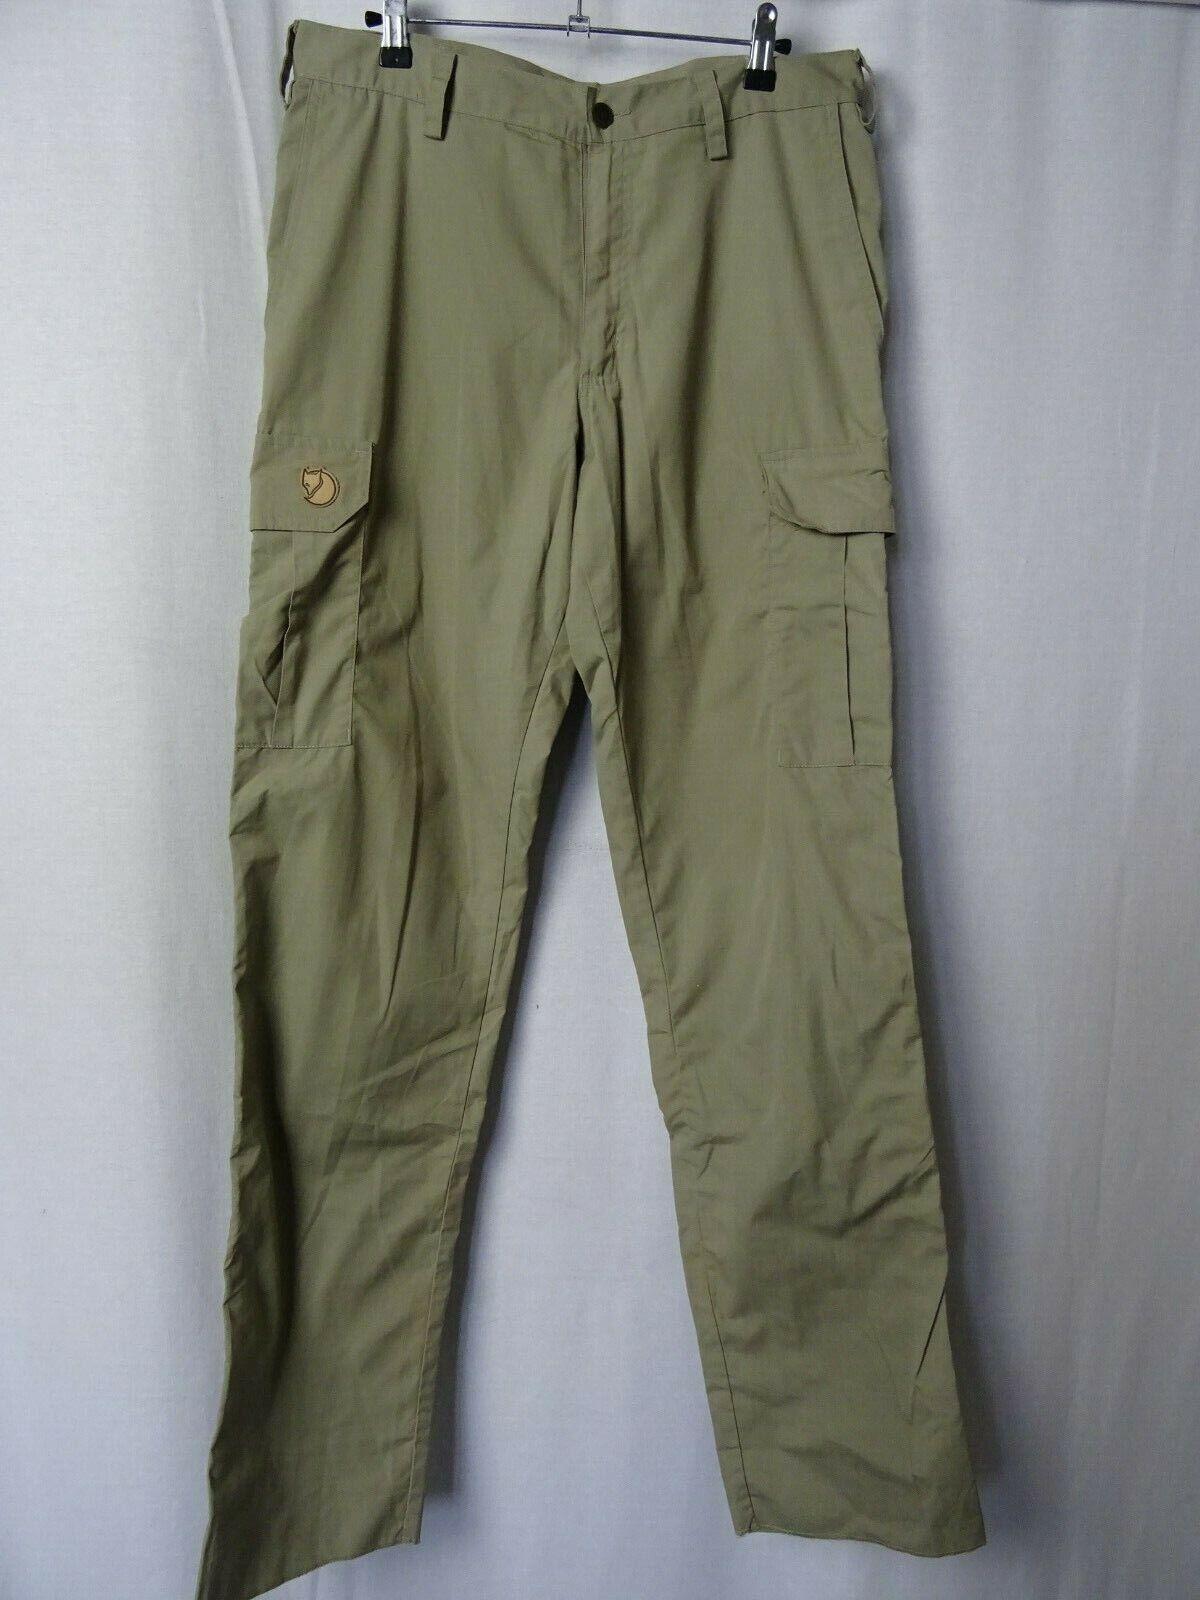 Men's Fjällräven Reivo G-1000 Trousers Outdoor Pants W32 L36